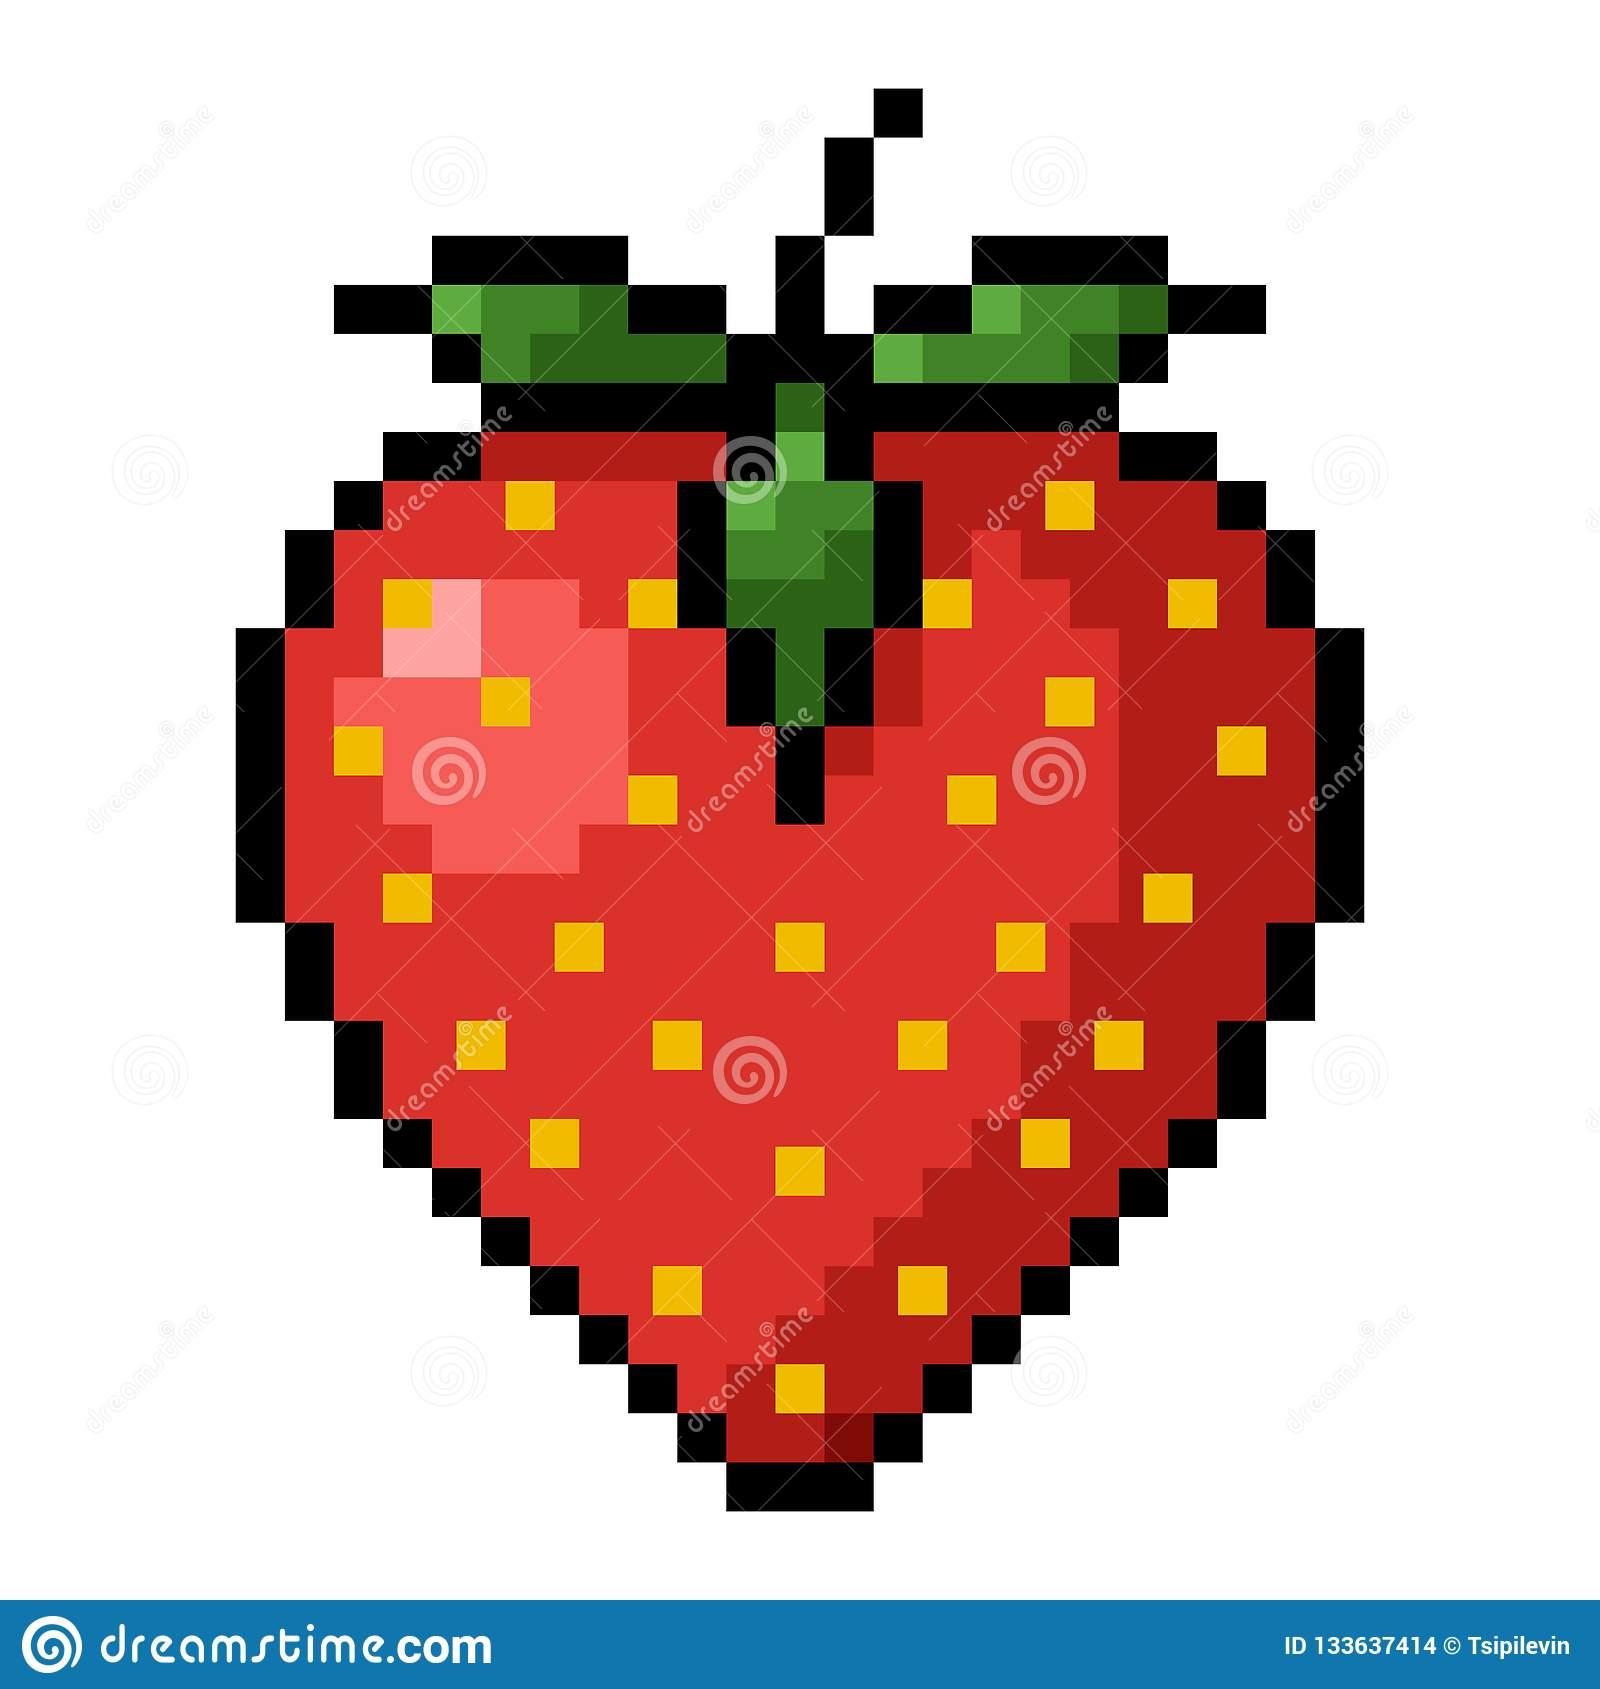 Art De Pixel De Fraise Illustration Stock. Illustration Du dedans Pixel Art Fraise